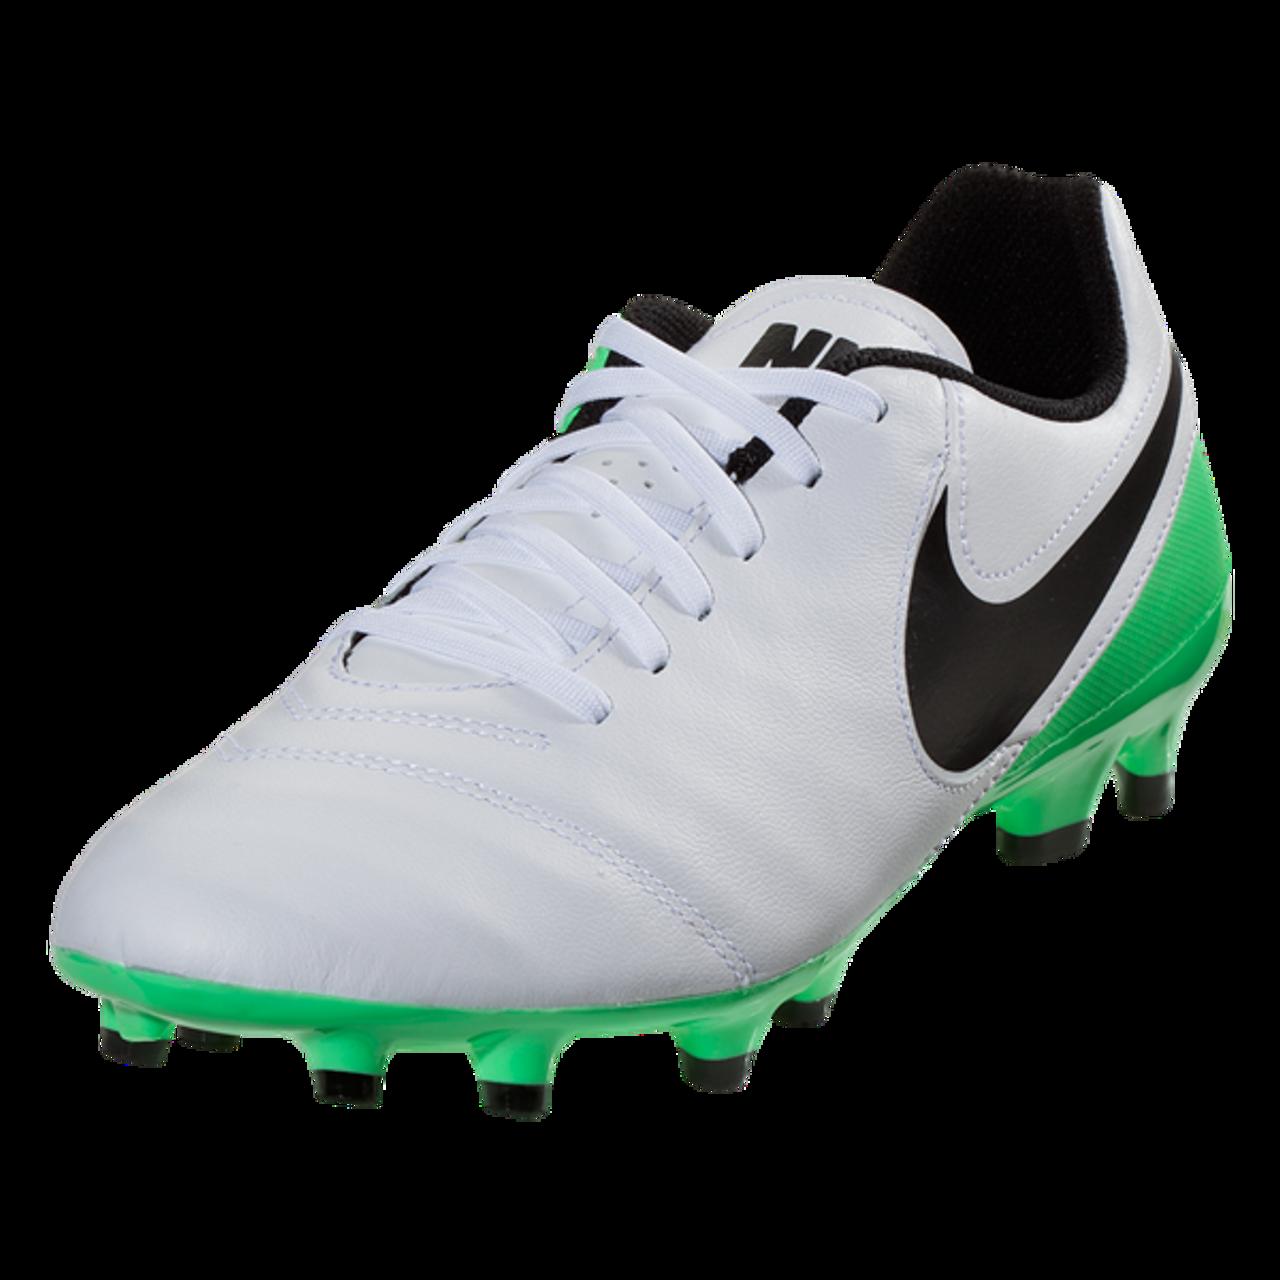 newest c8f67 8ffbe Nike Tiempo Genio II Leather FG - WhiteBlackElectro Green(41917) - ohp  soccer